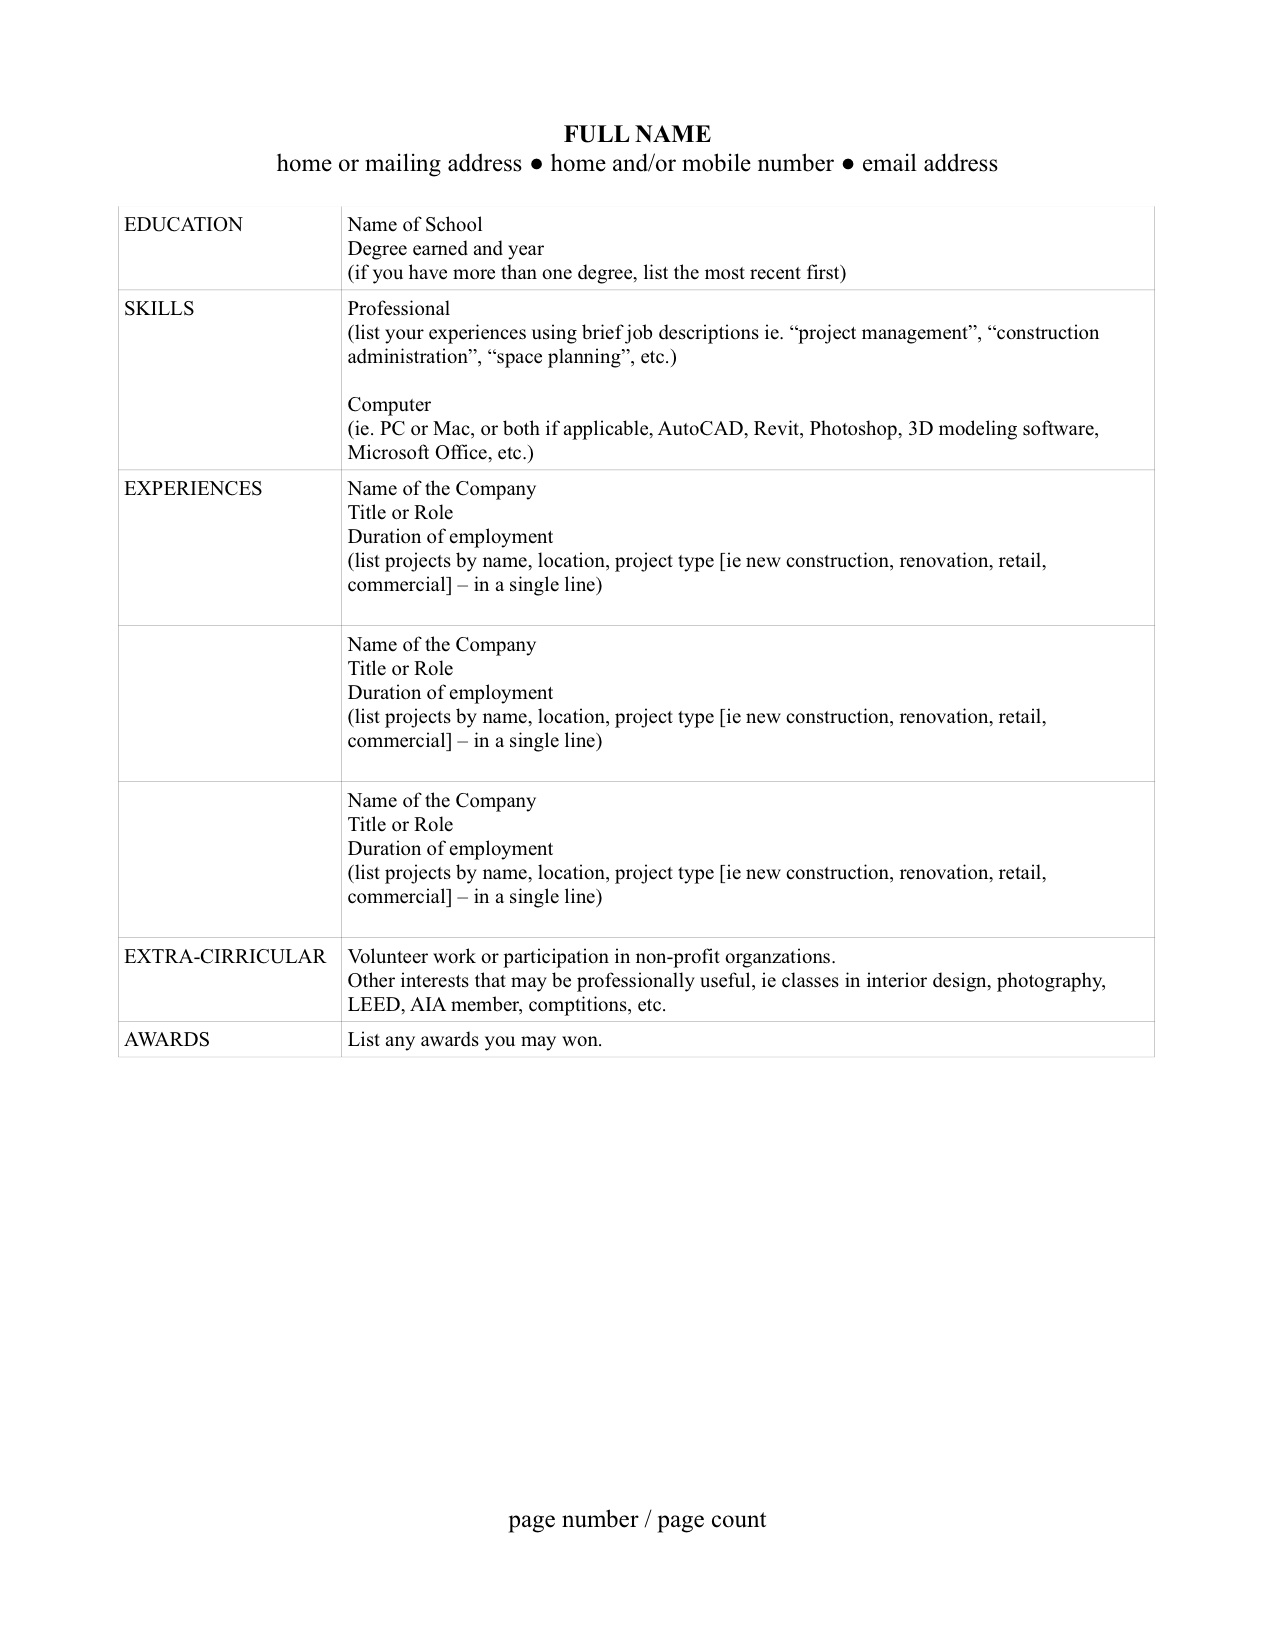 mba resume font sample customer service resume mba resume font how to write a resume for mba admissions applications sample resume mba sample